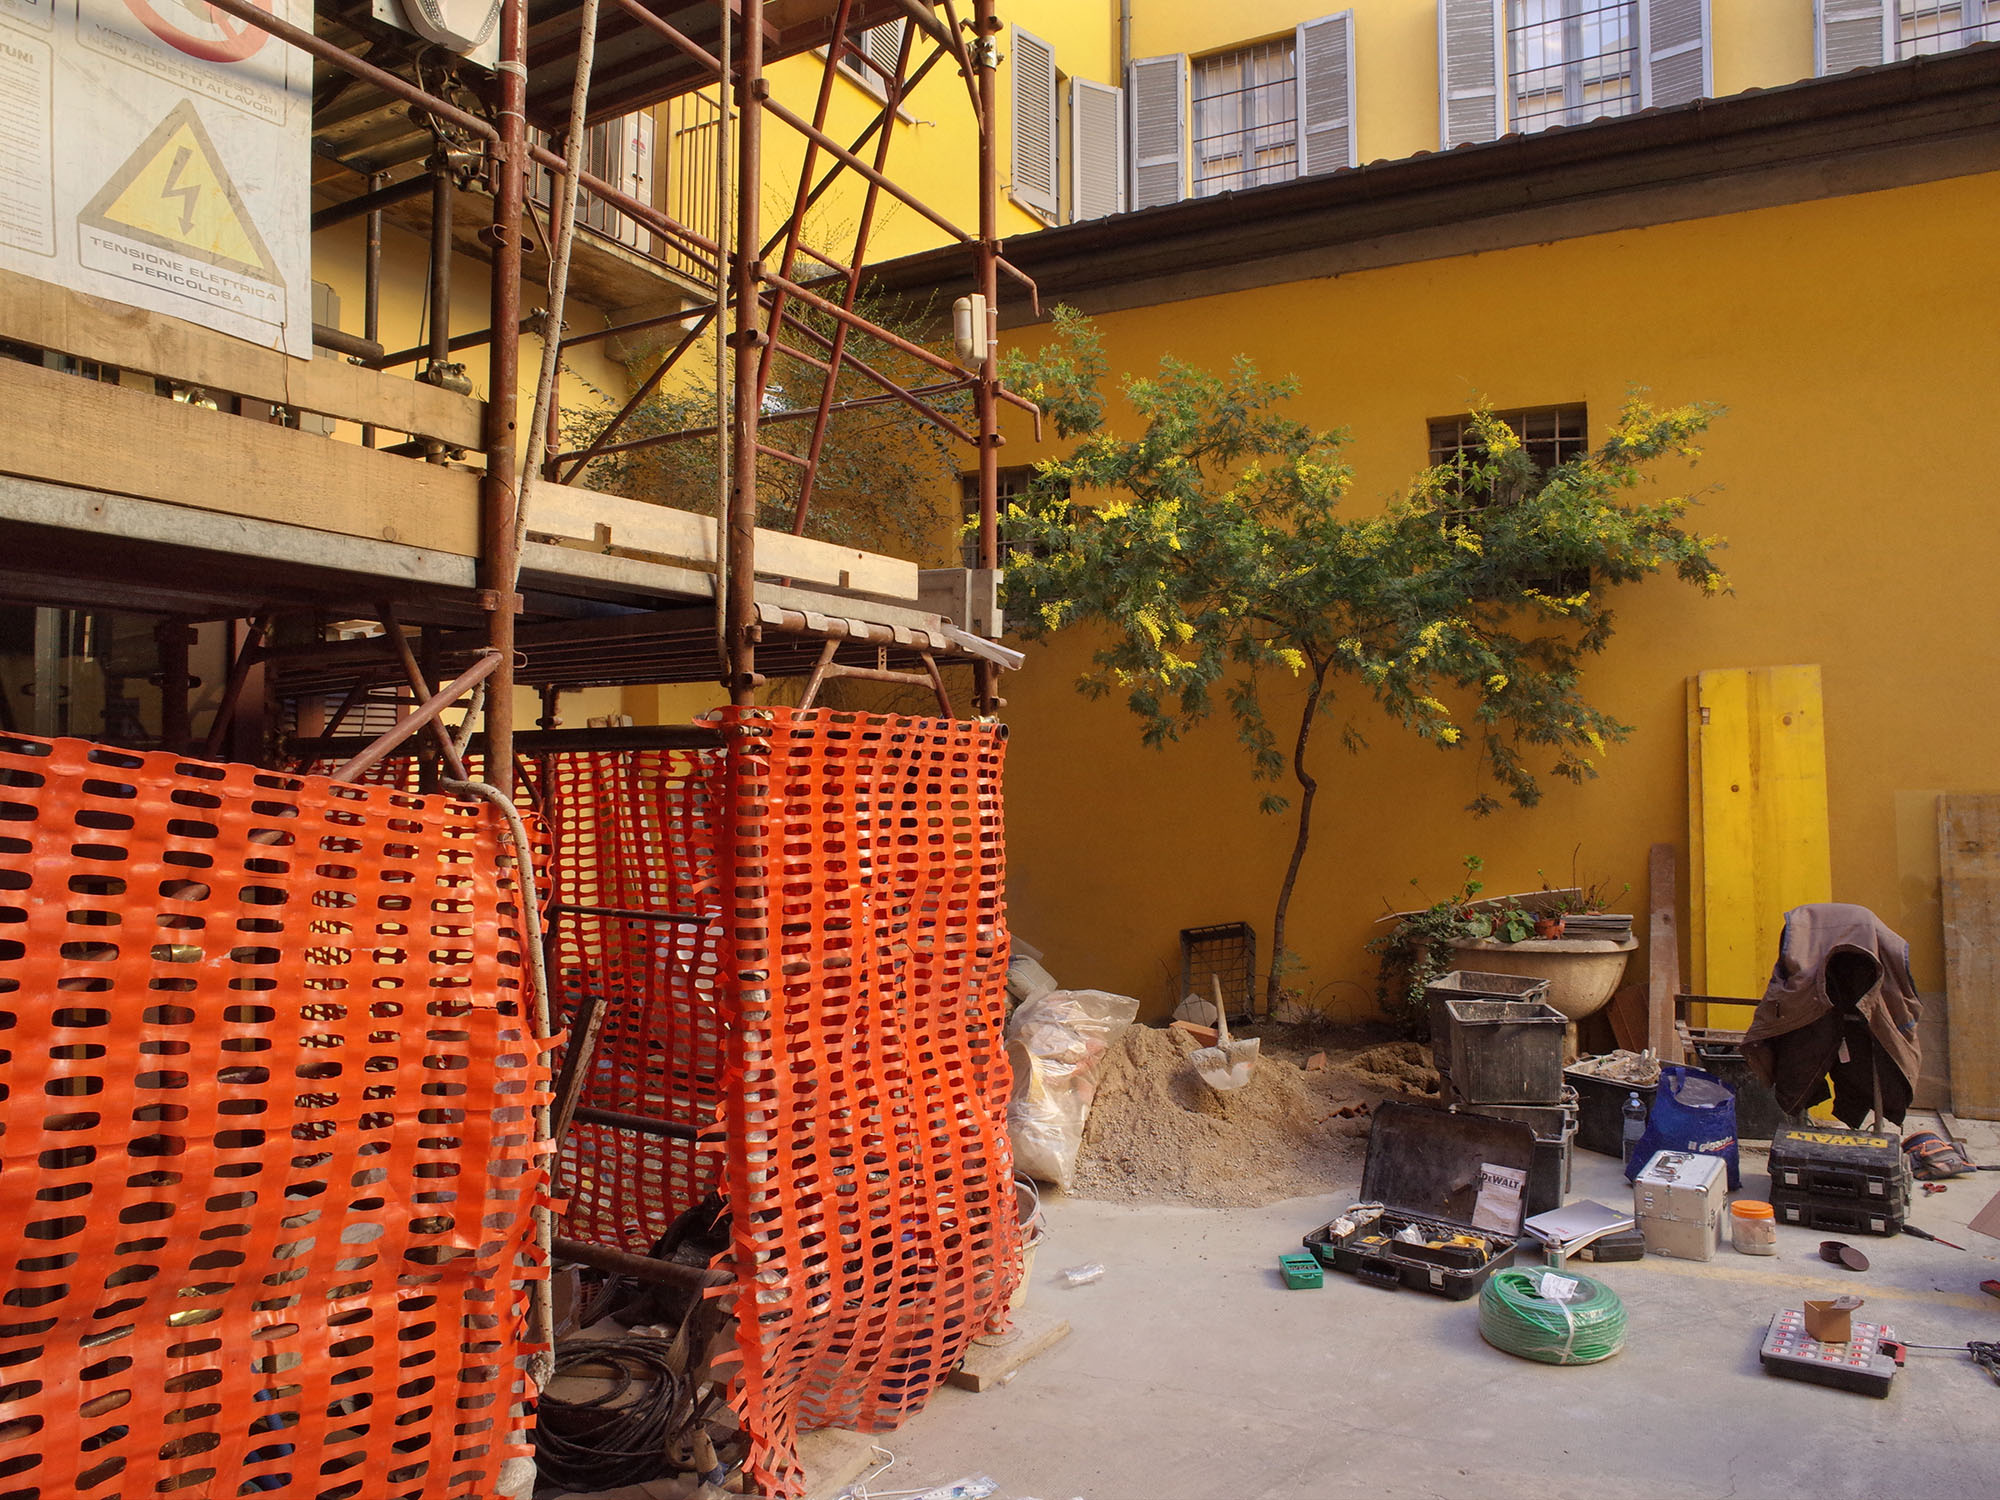 milan cour chantier 2015